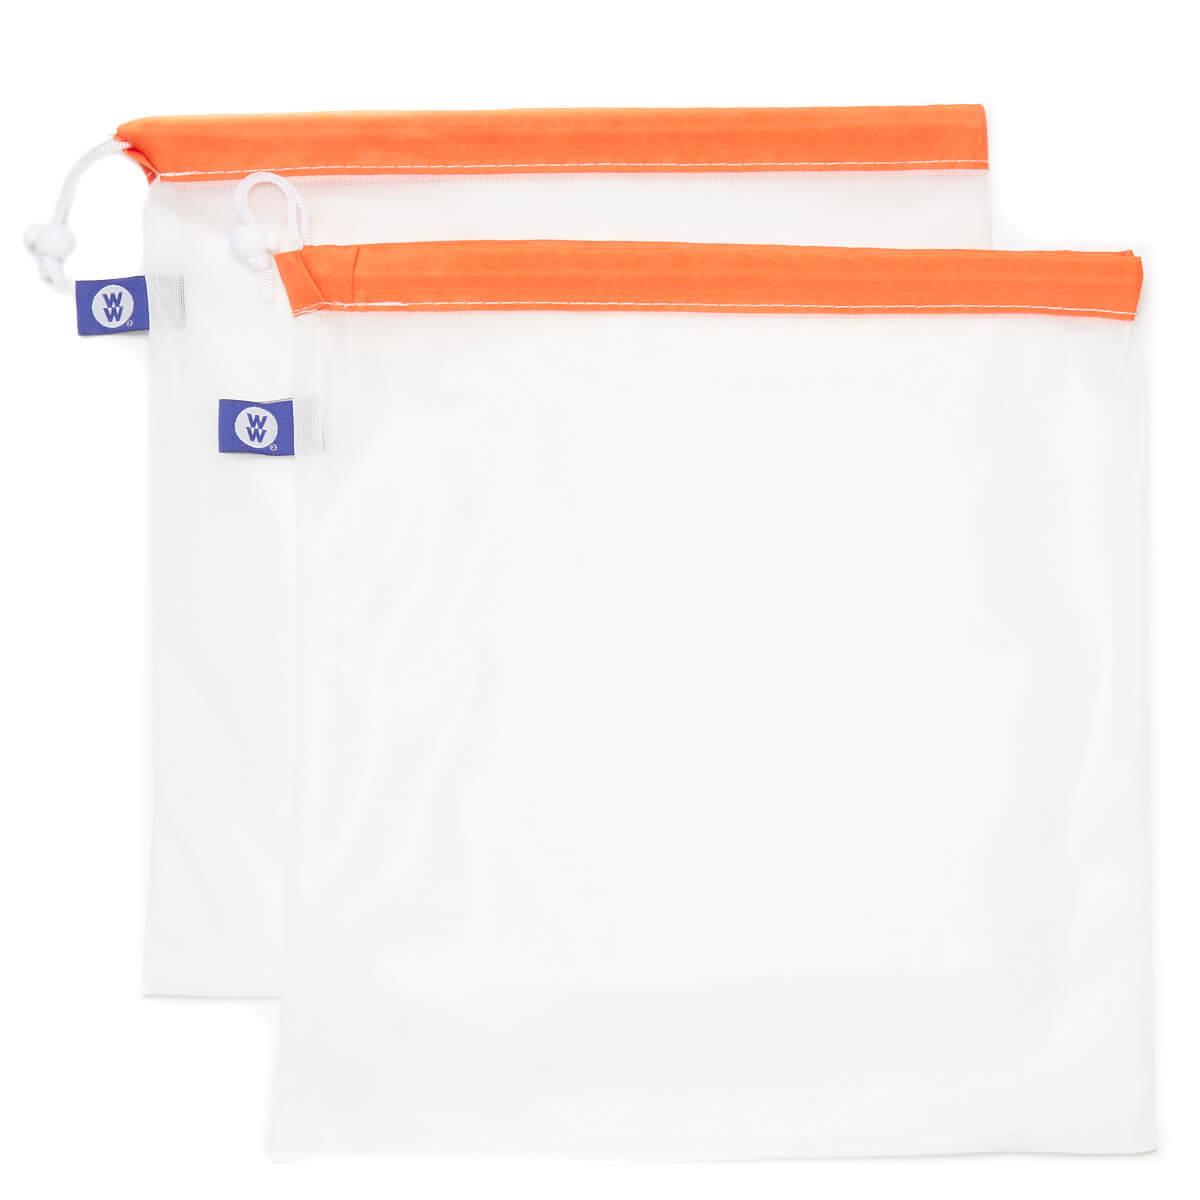 WW Reusable Produce Bags - medium